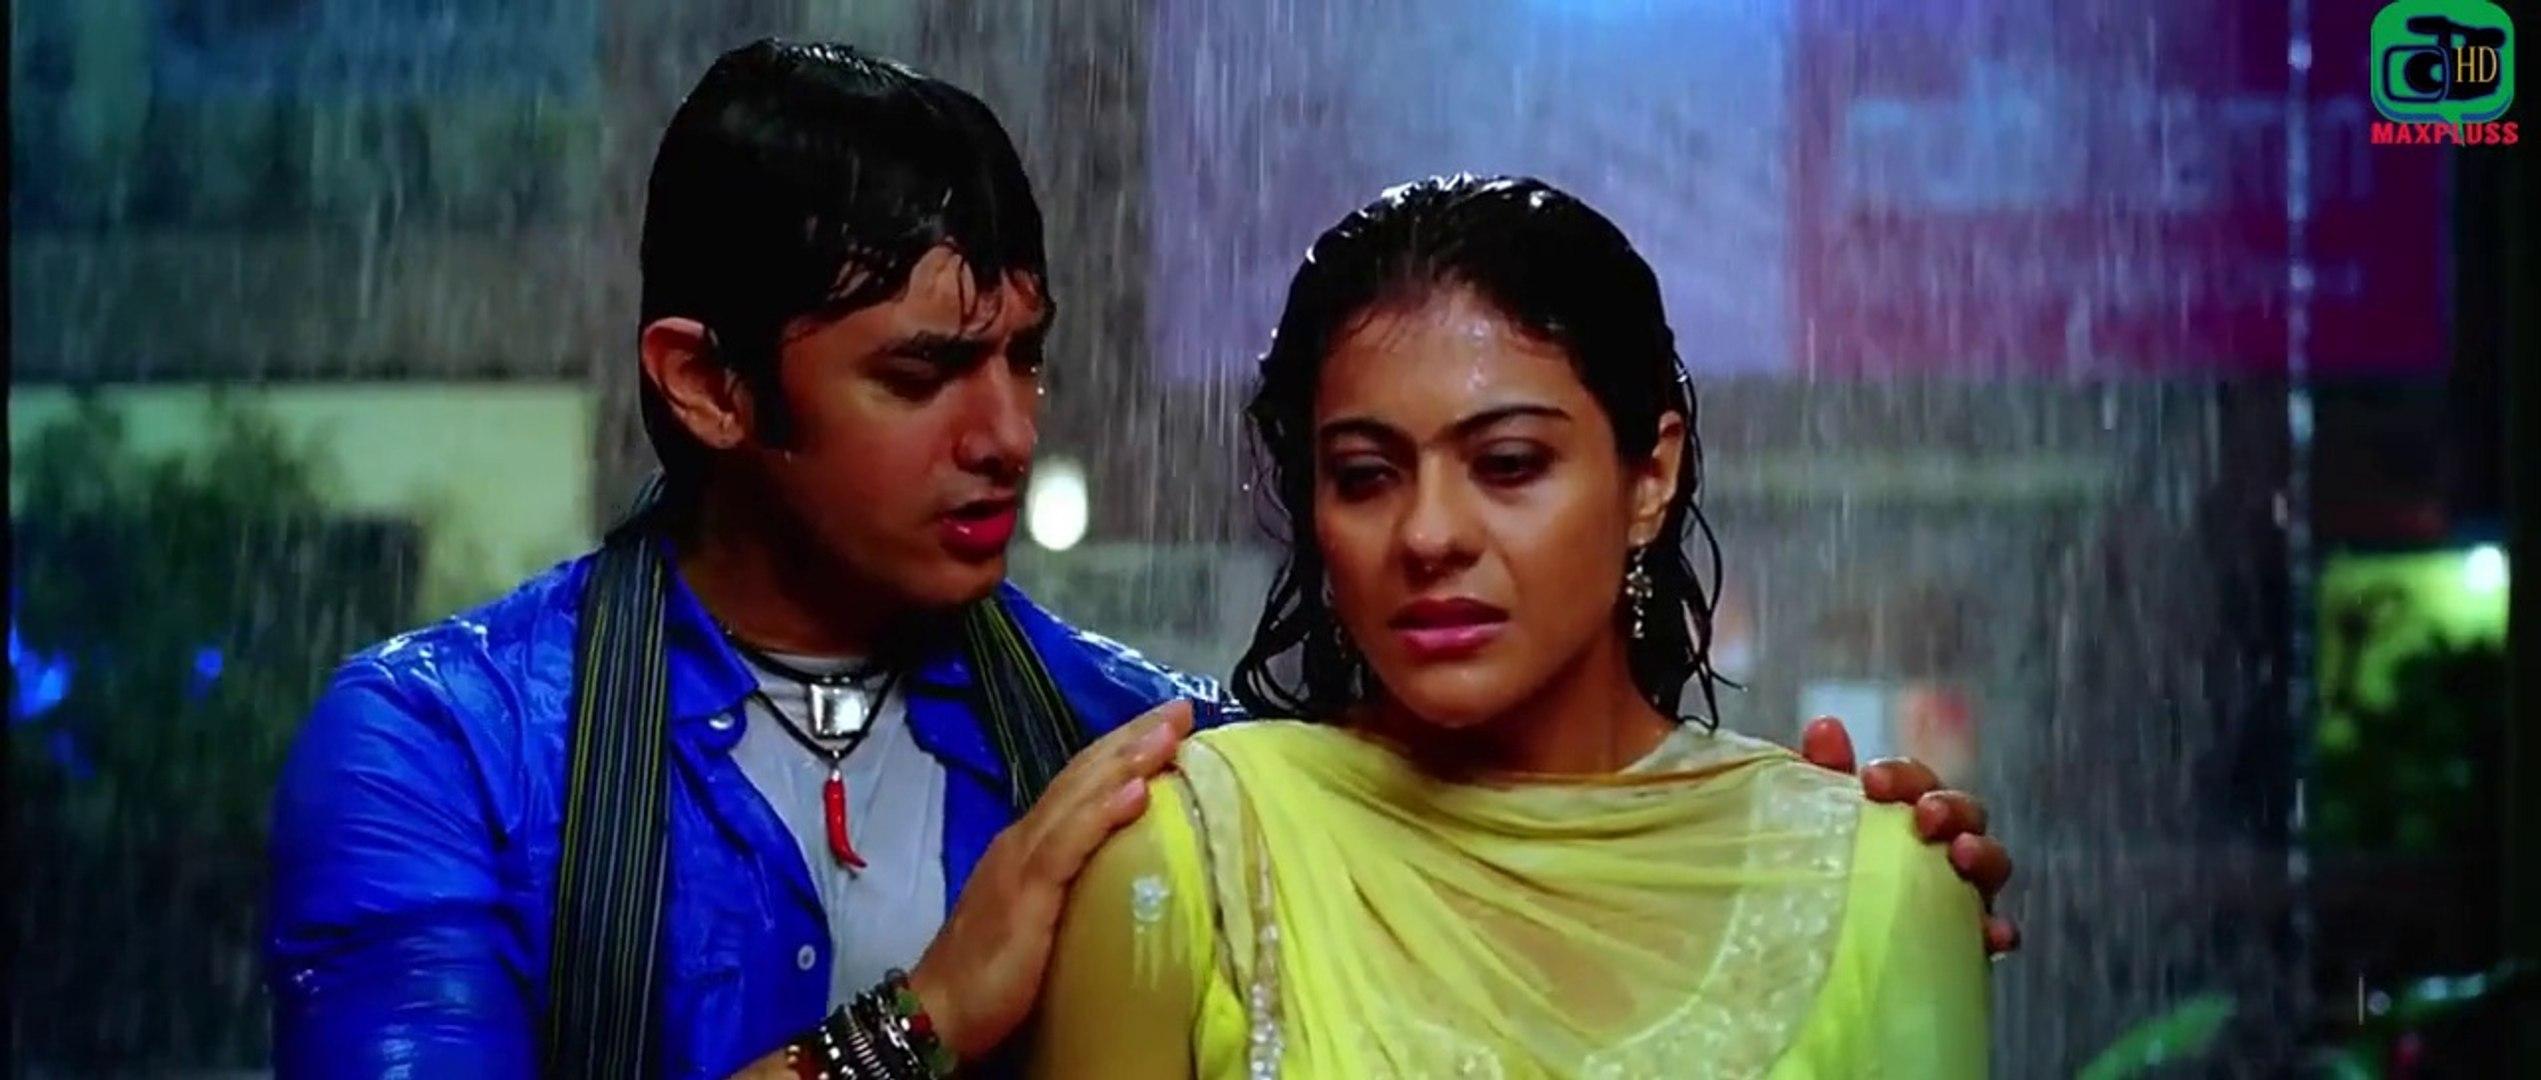 Dekho Na Full Video Song Hd 720p Fanaa Amir Khan Kajol Maxpluss Video Dailymotion